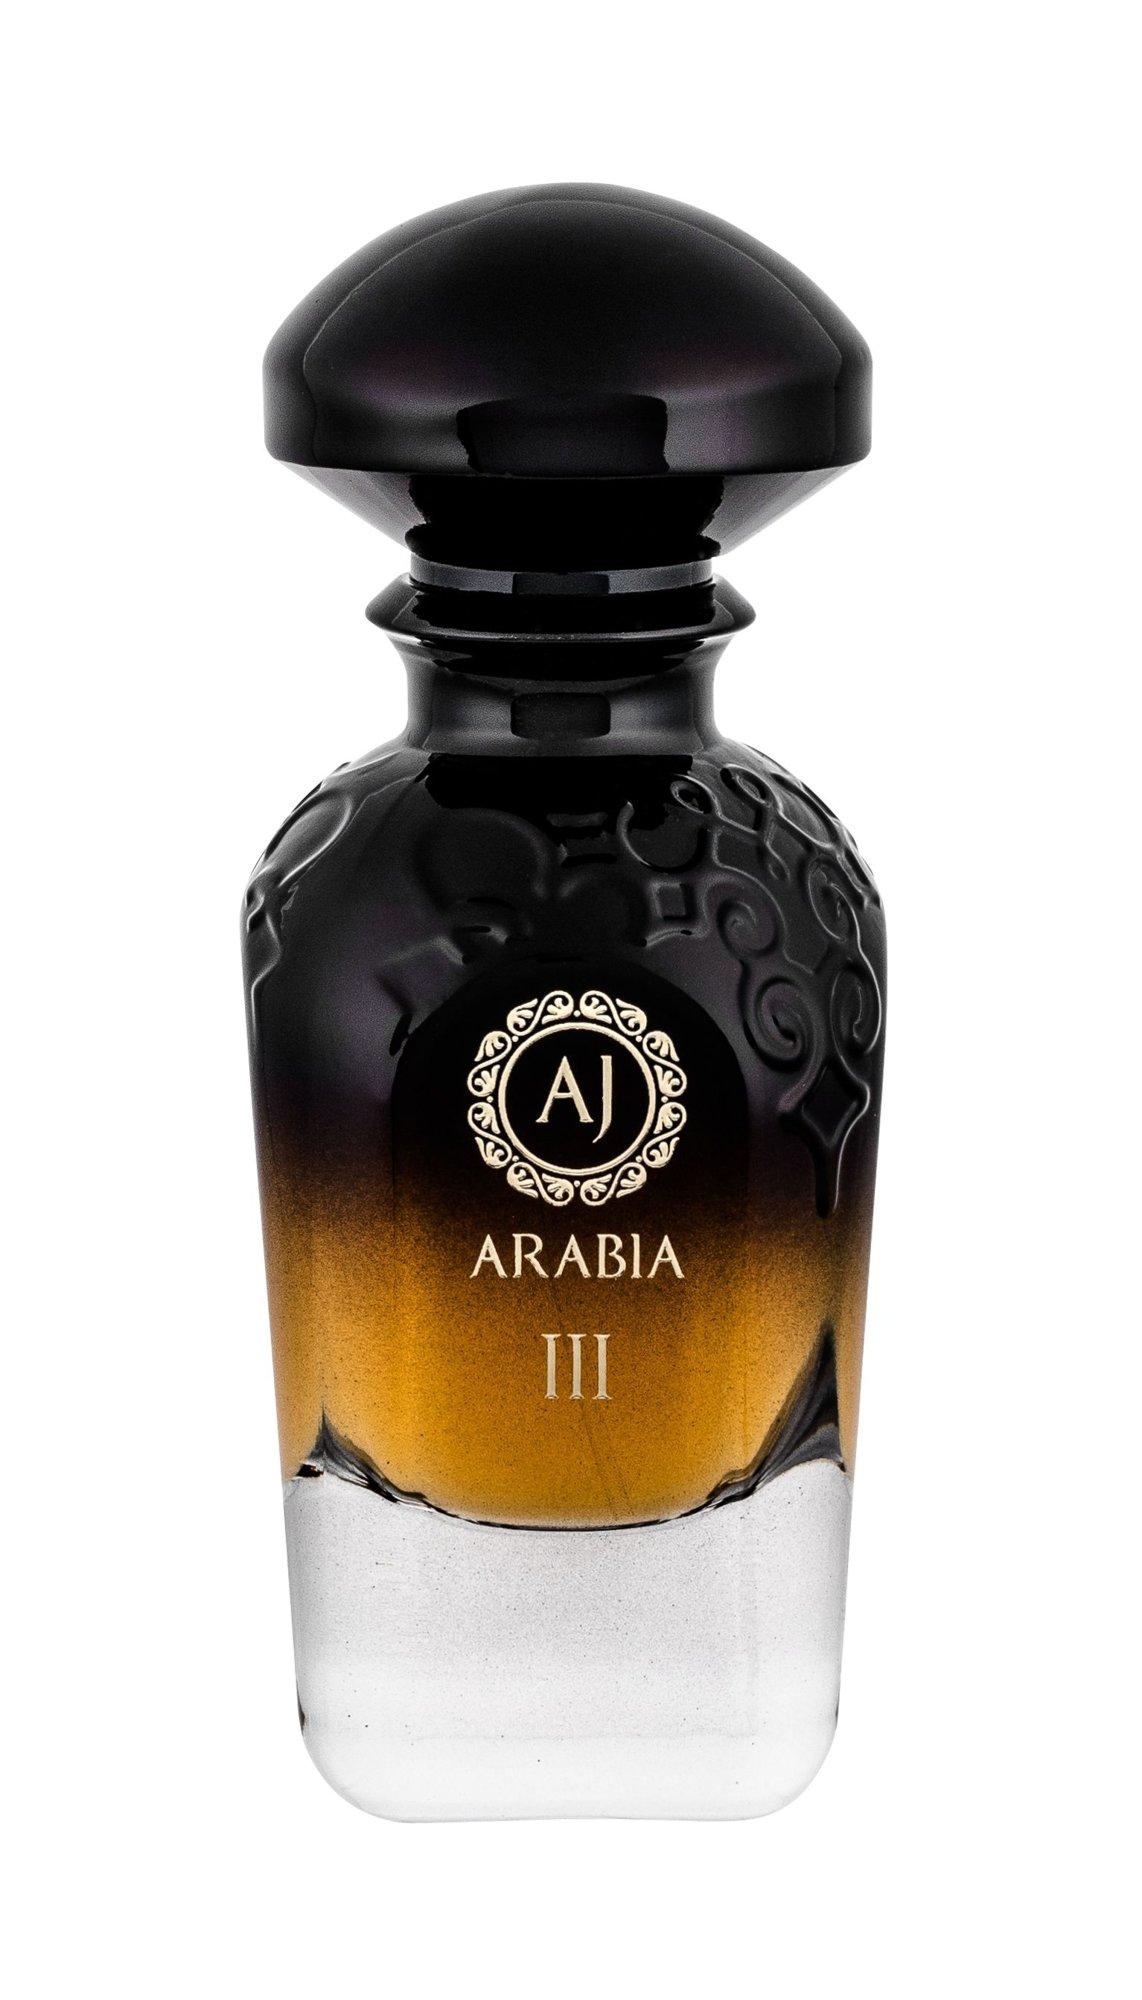 Widian Aj Arabia Black Collection III Perfume 50ml